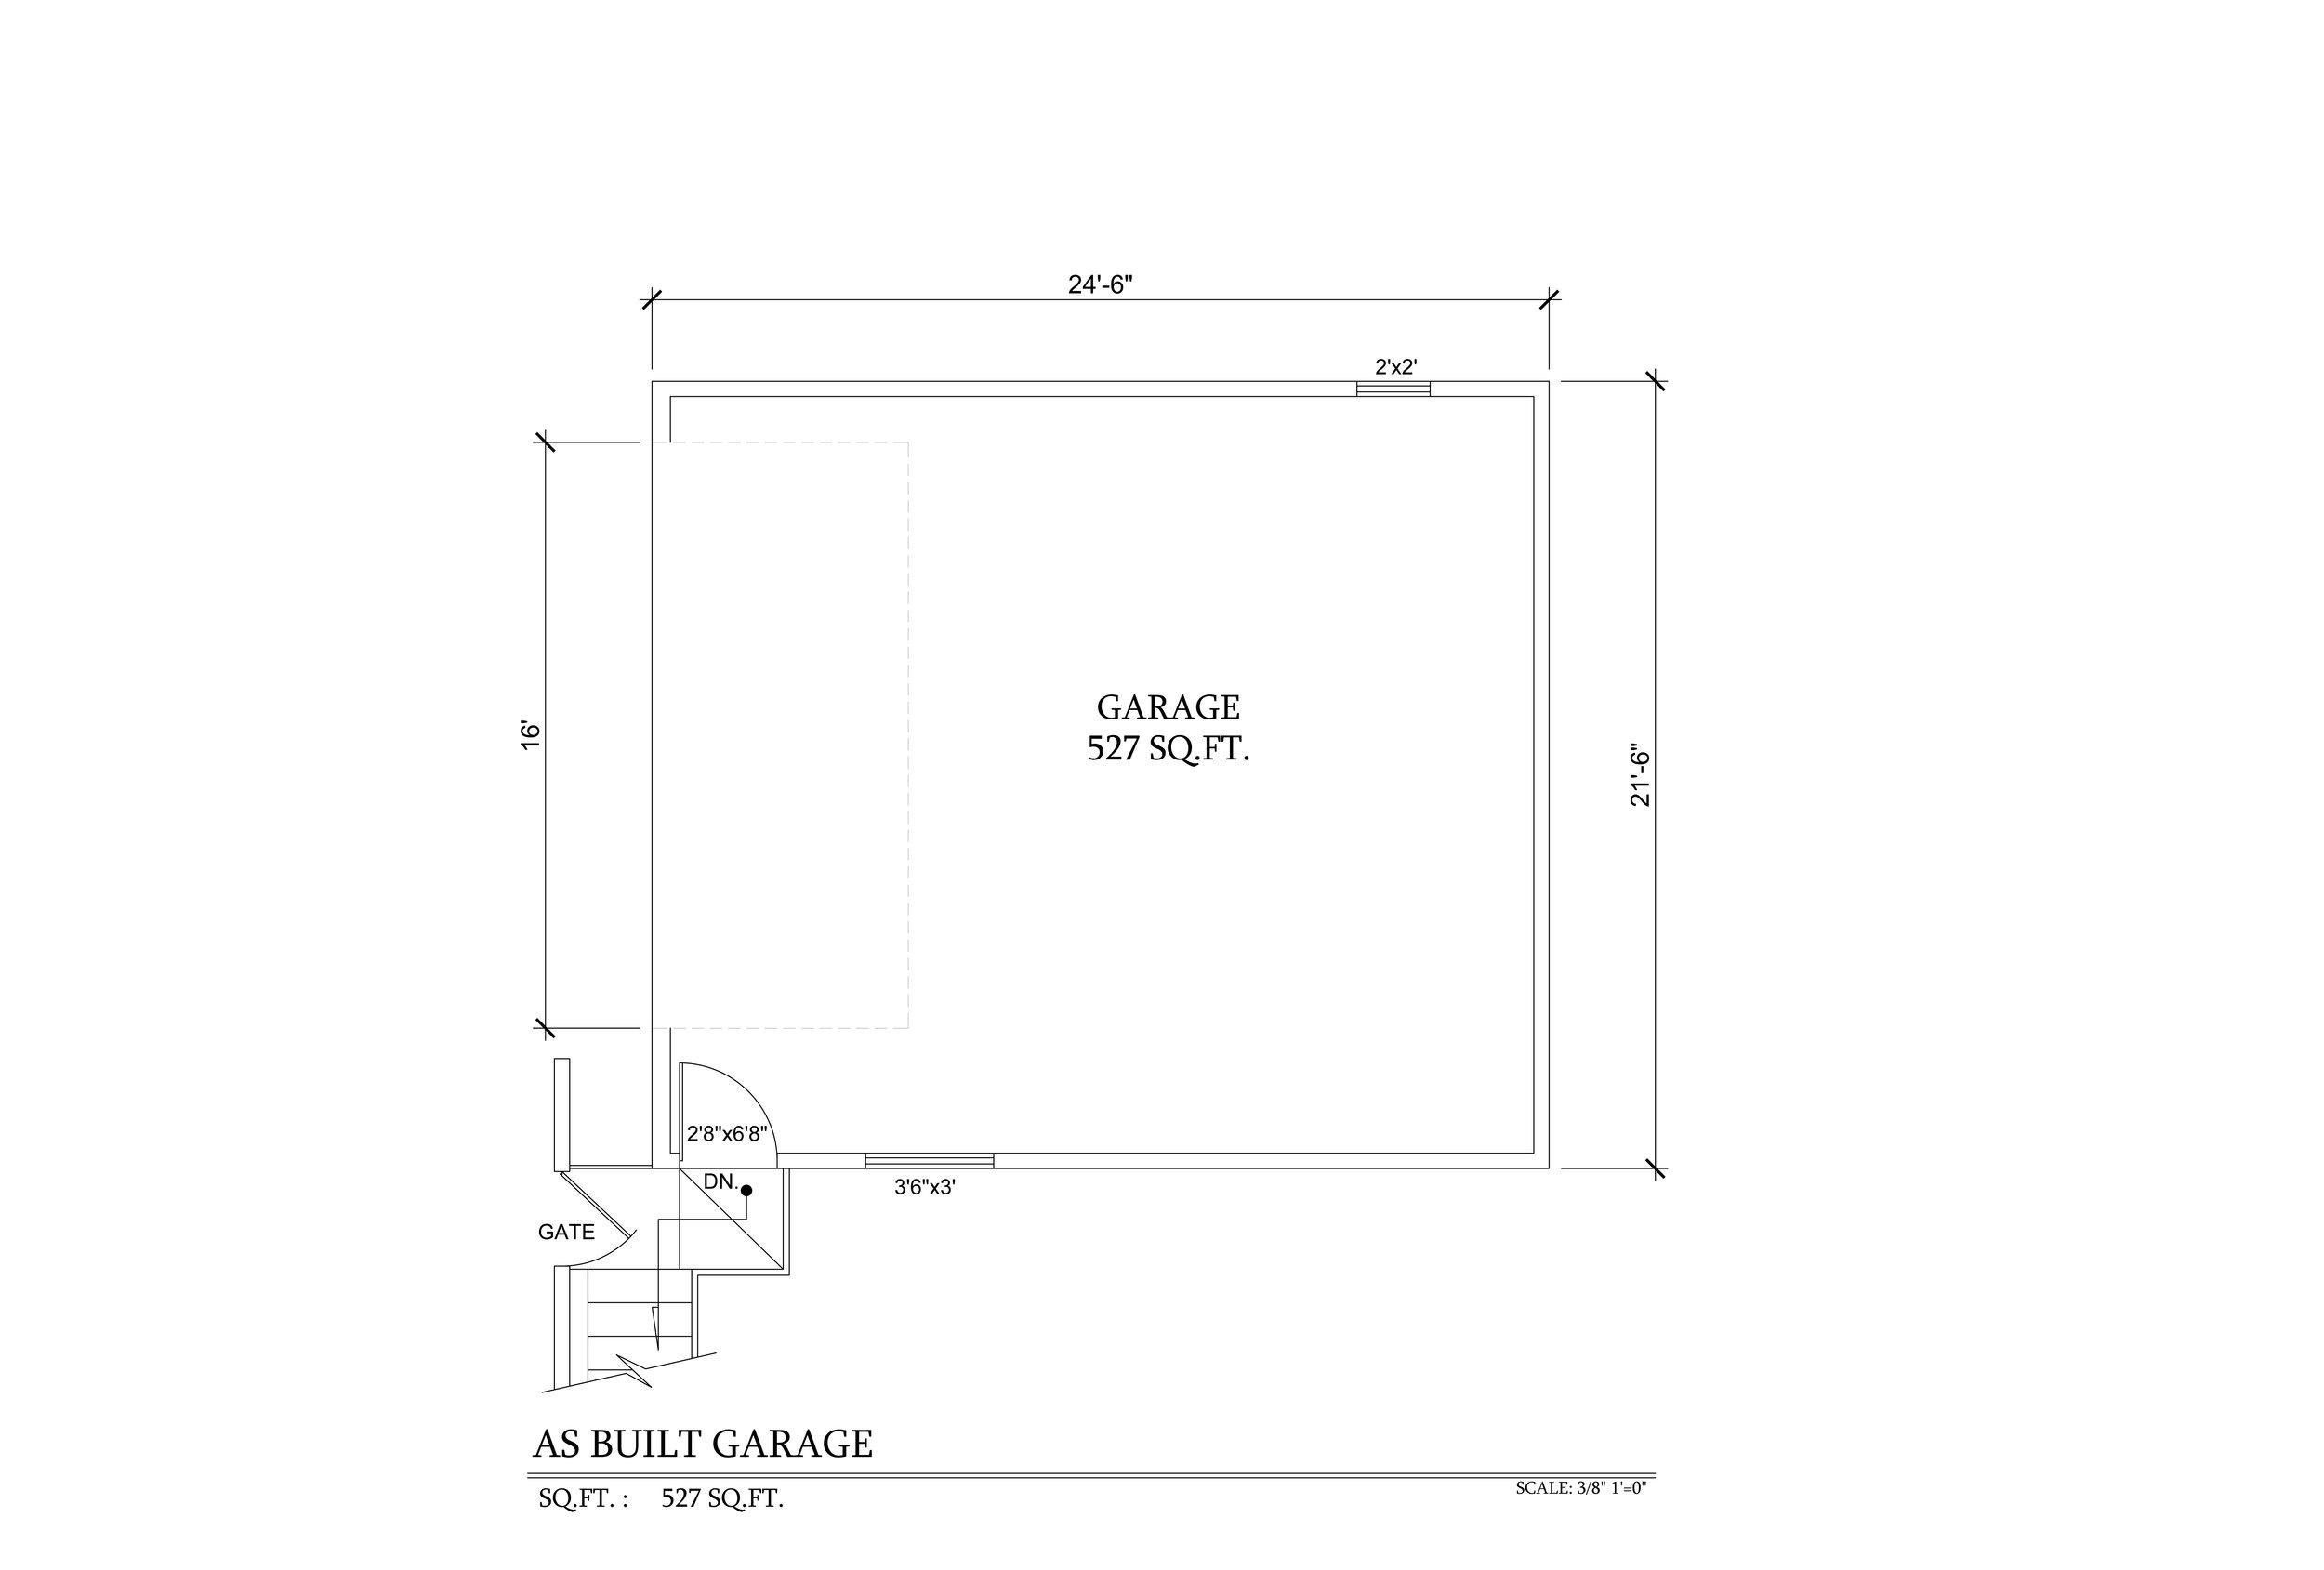 As Built Garage 3355 N copy.Knoll Dr 3-15-15.jpg